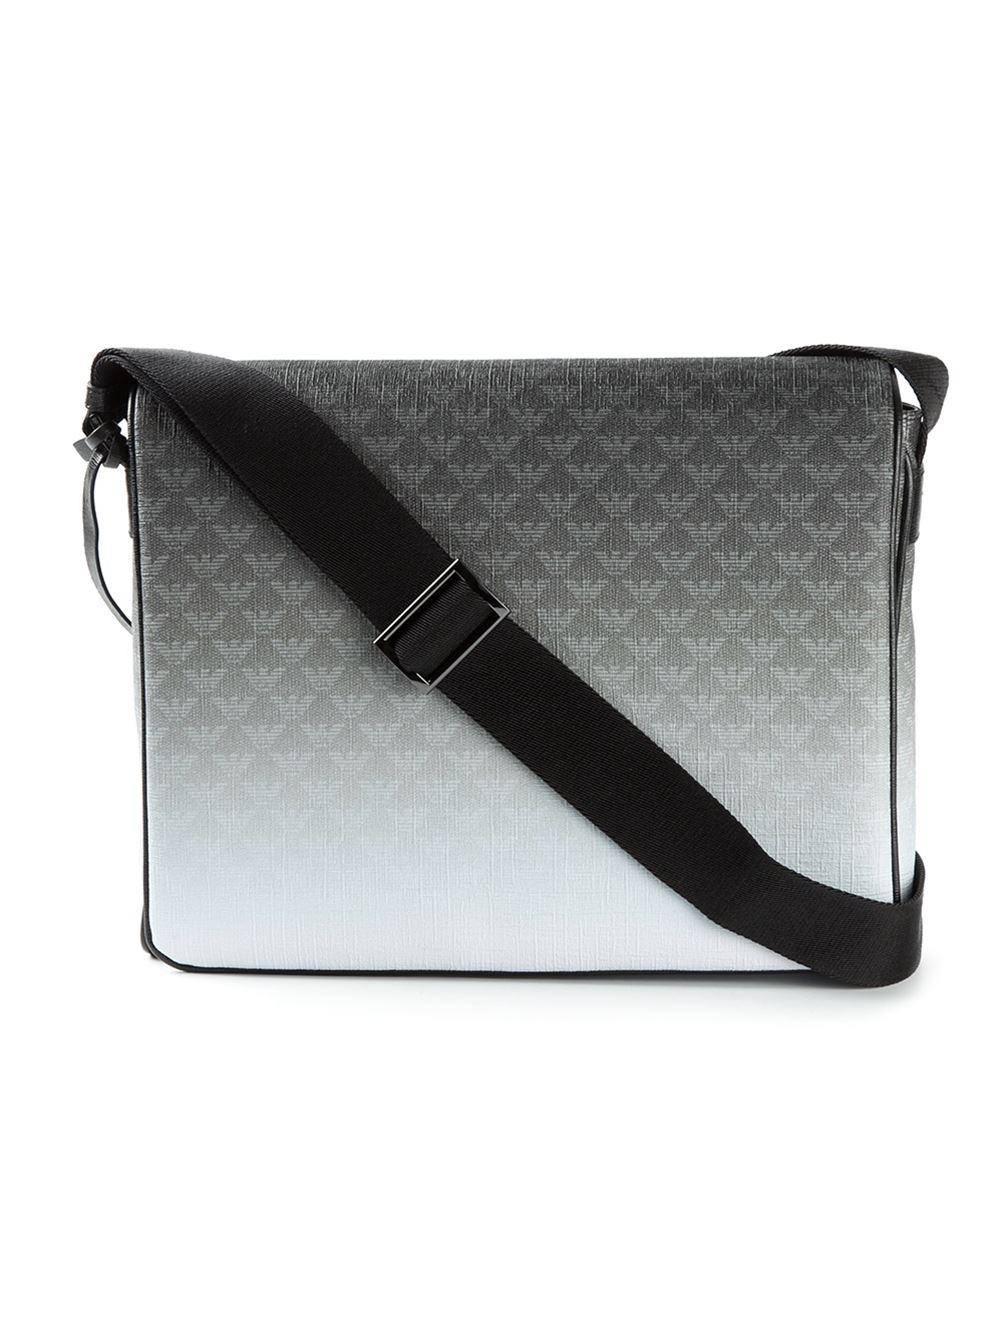 381911120d95 Emporio Armani Logo Print Messenger Bag in Gray for Men - Lyst